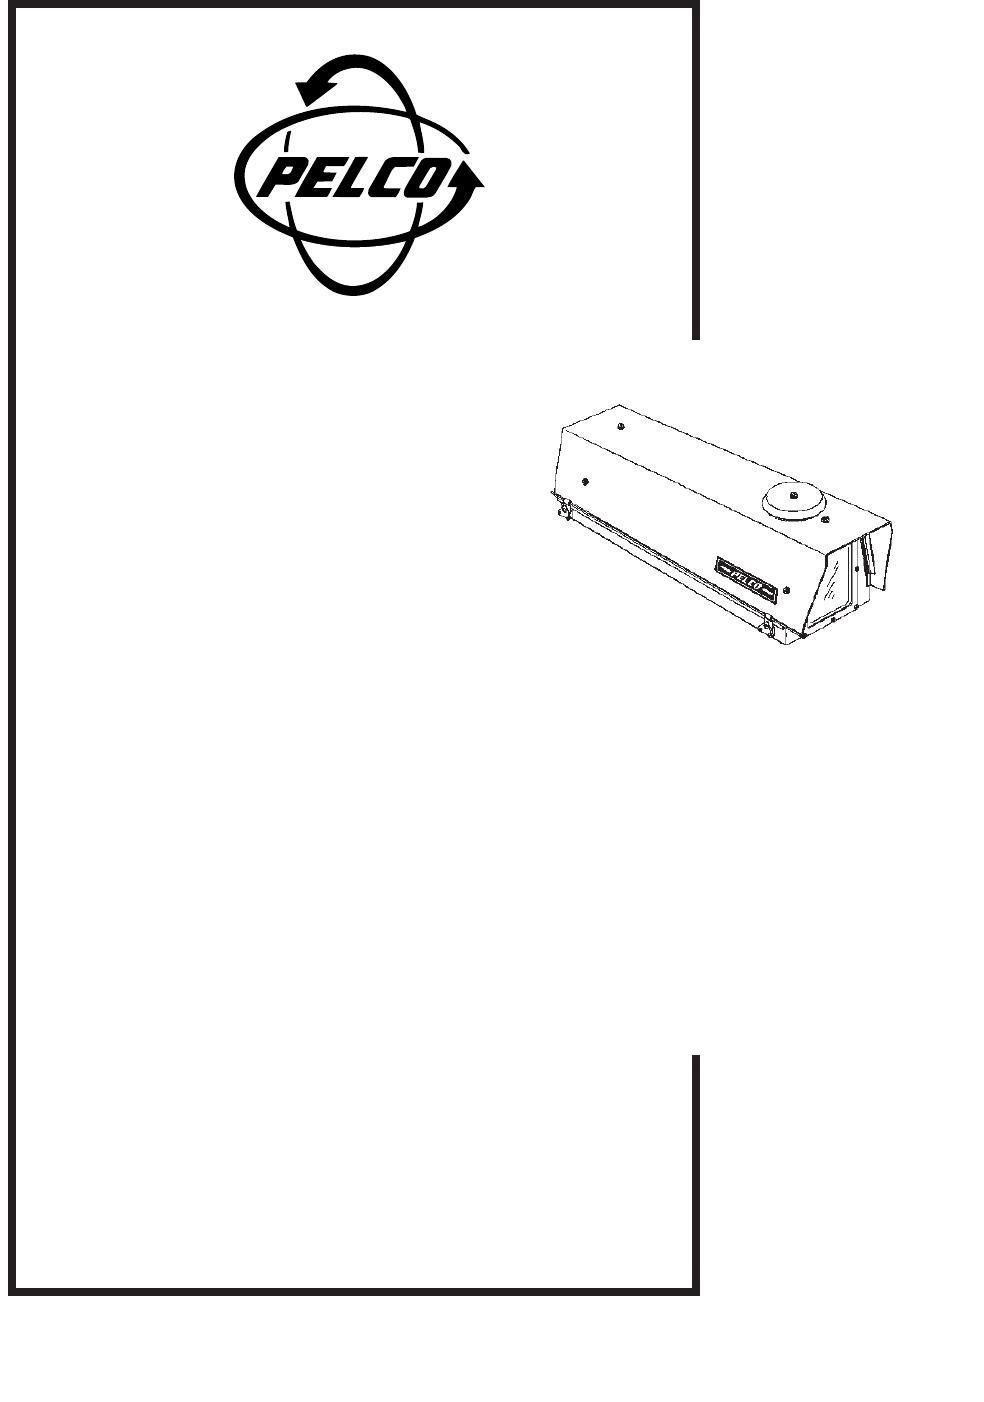 medium resolution of pelco manual c411m d 1 96 17